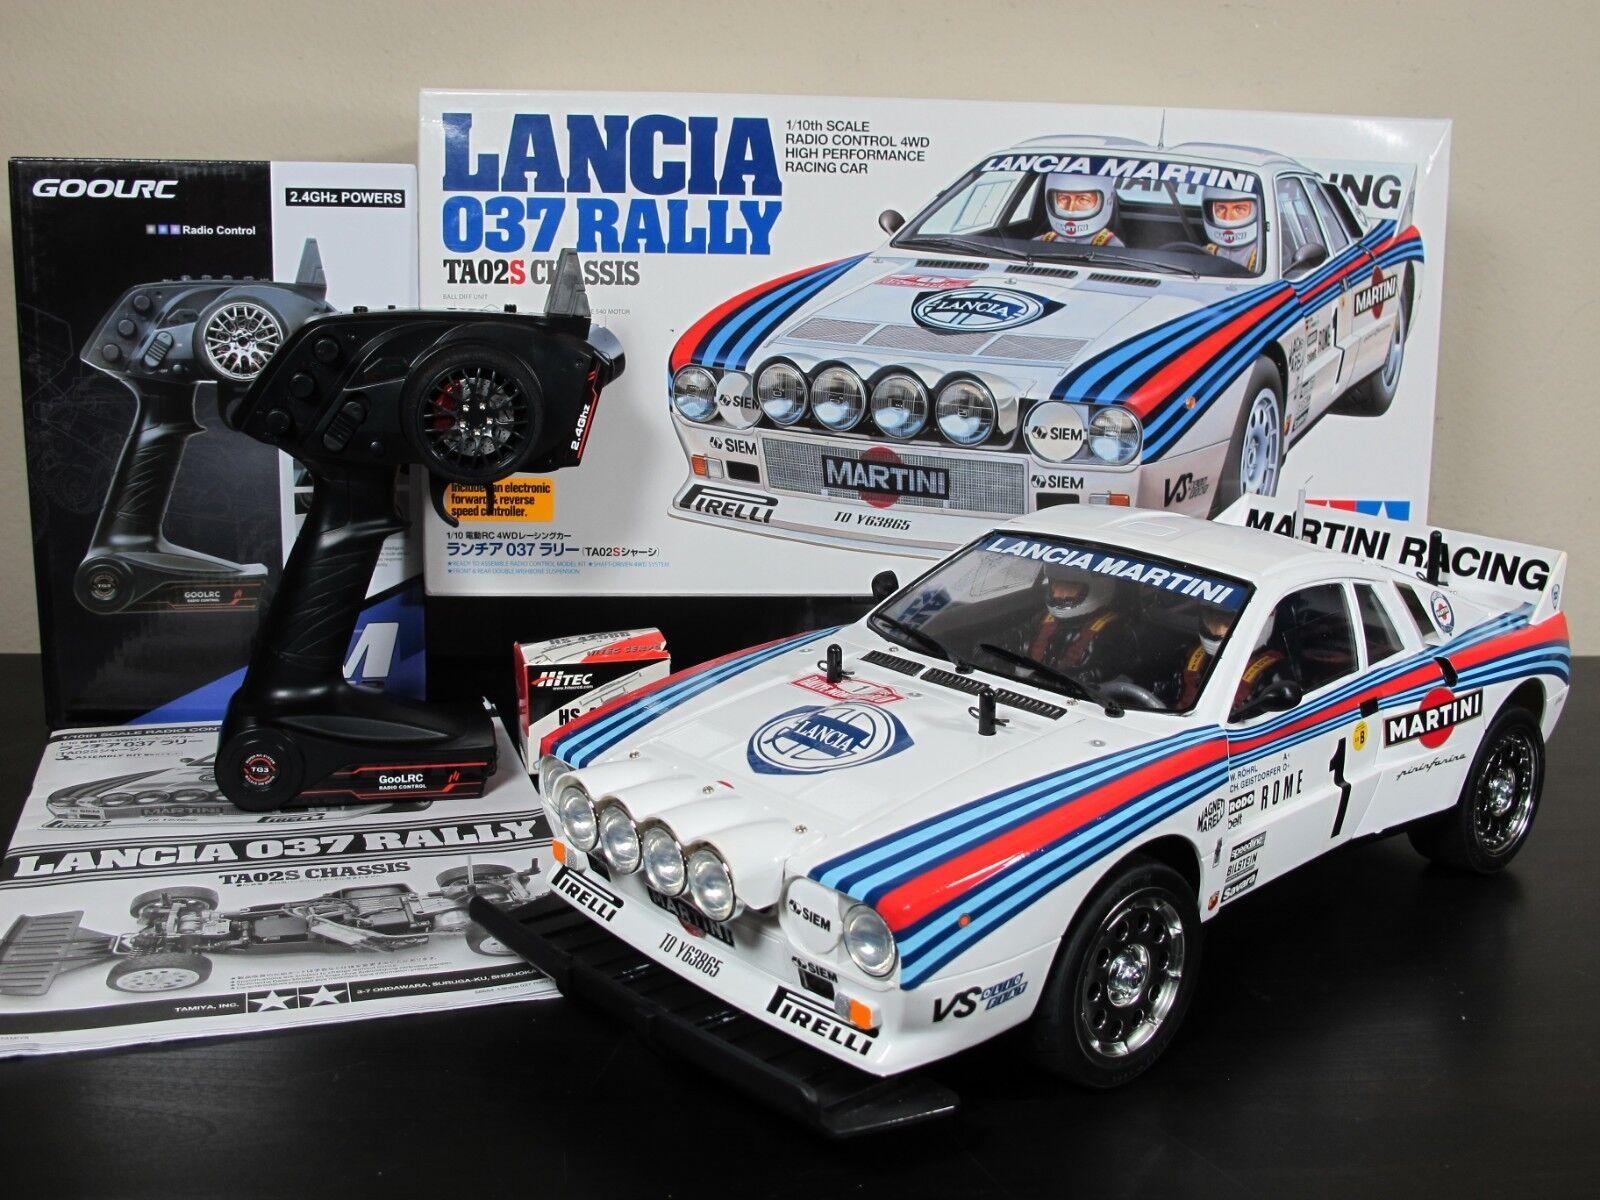 Neubau tamiya r   c 1   10 lancia 037 rally auto - ta-02s 58654 sender rtr